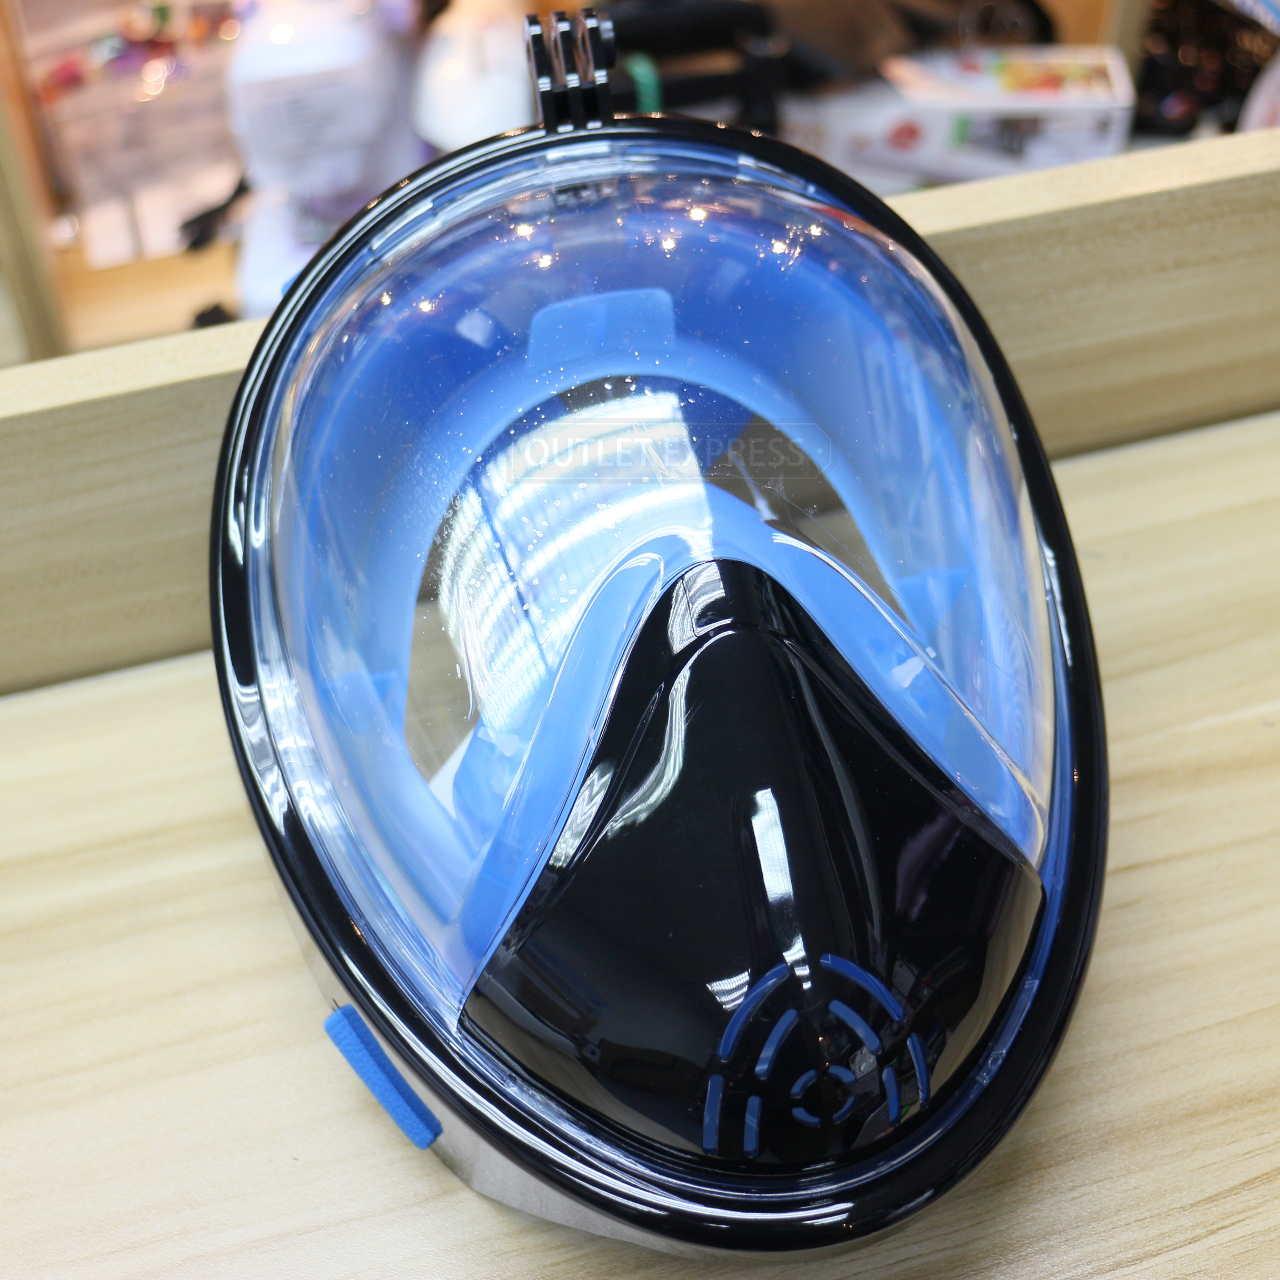 THENICE全乾式防霧浮潛面罩 黑藍- Outlet Express HK生活百貨城實拍相片